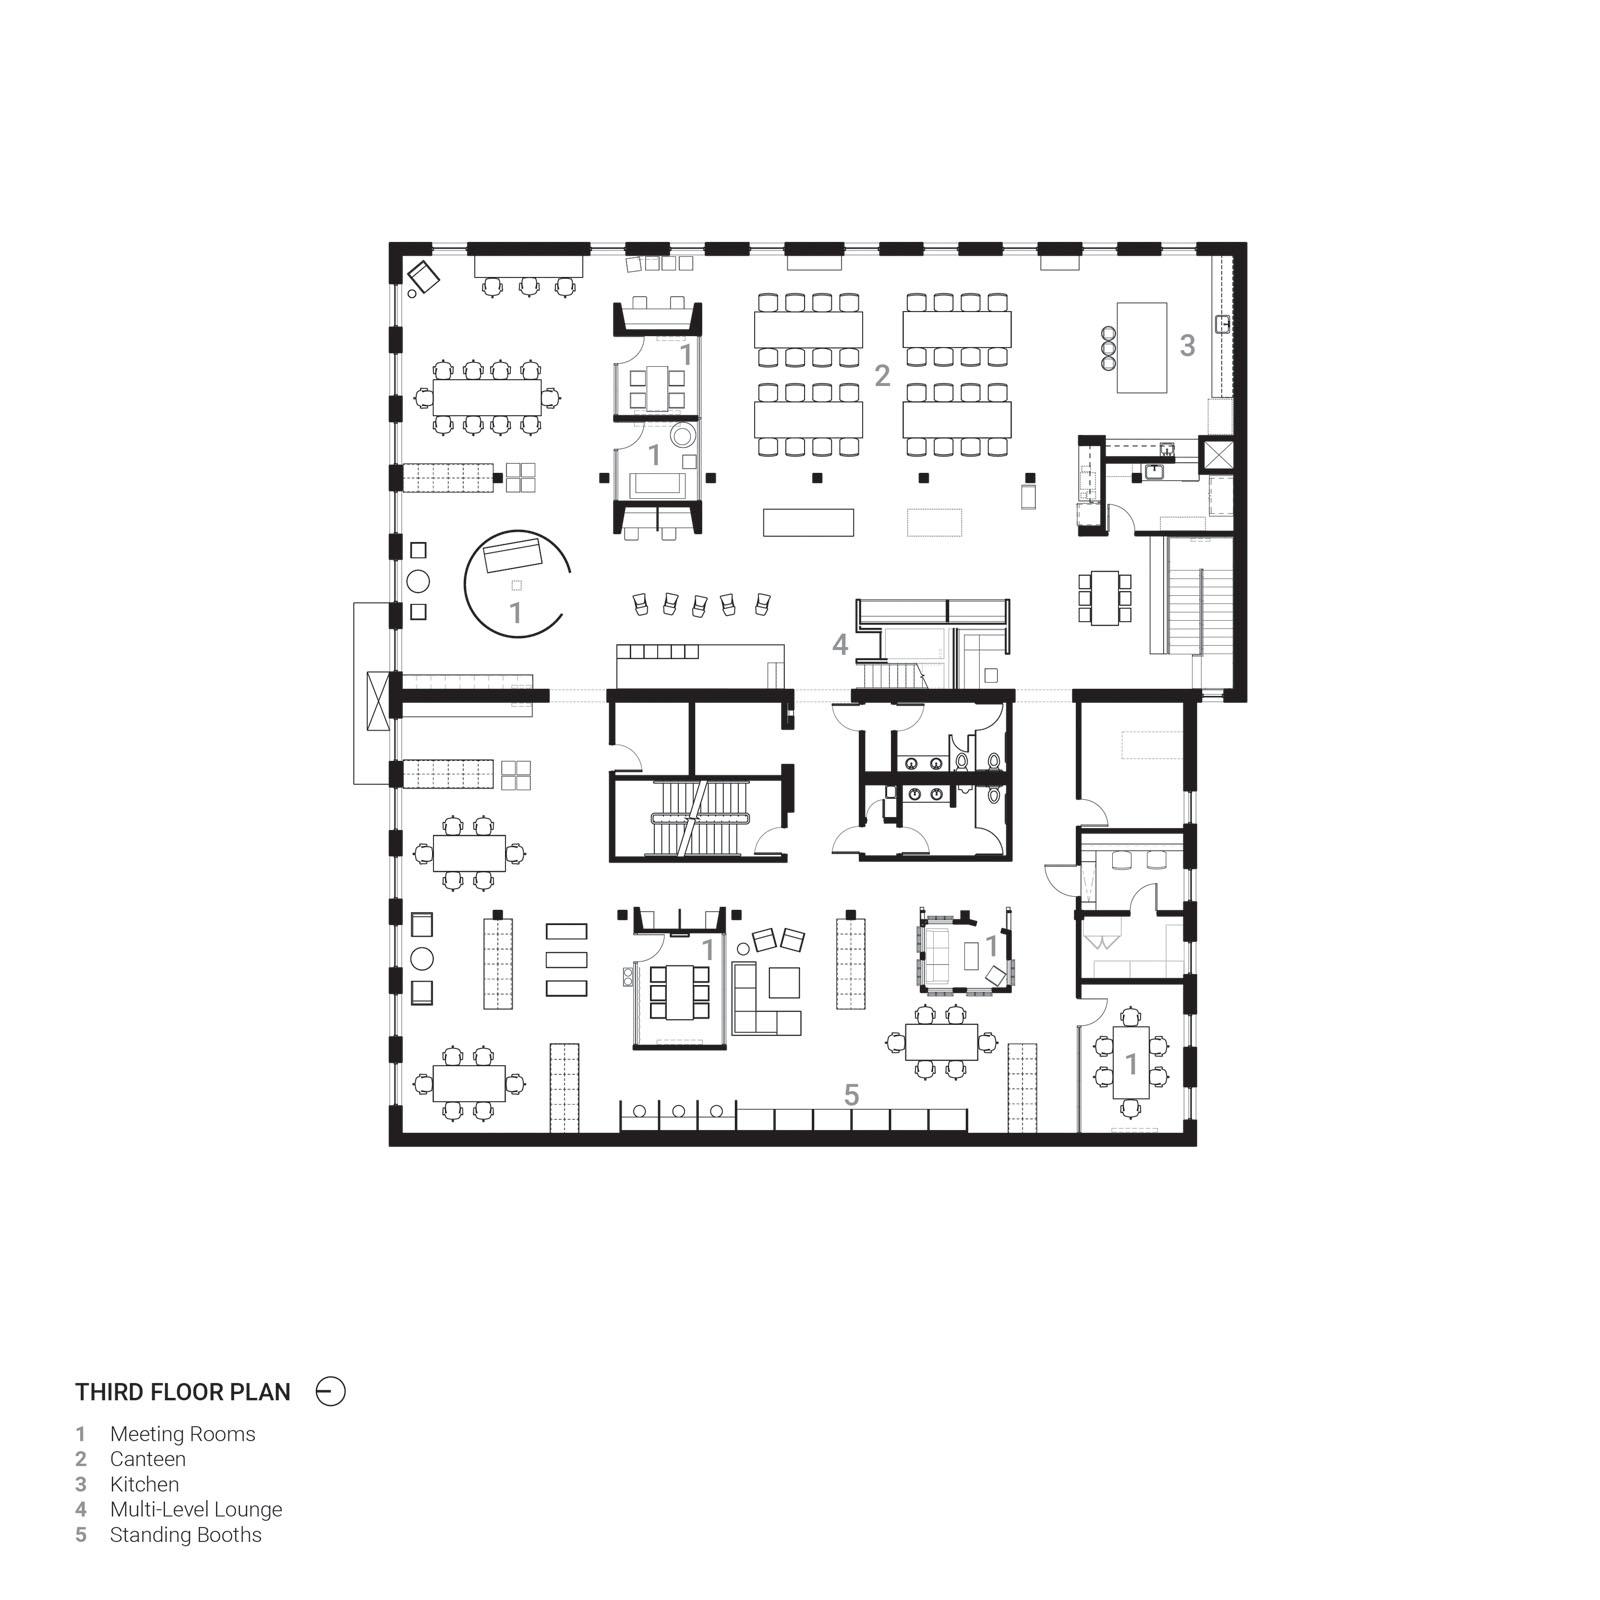 bora_third floor.jpg